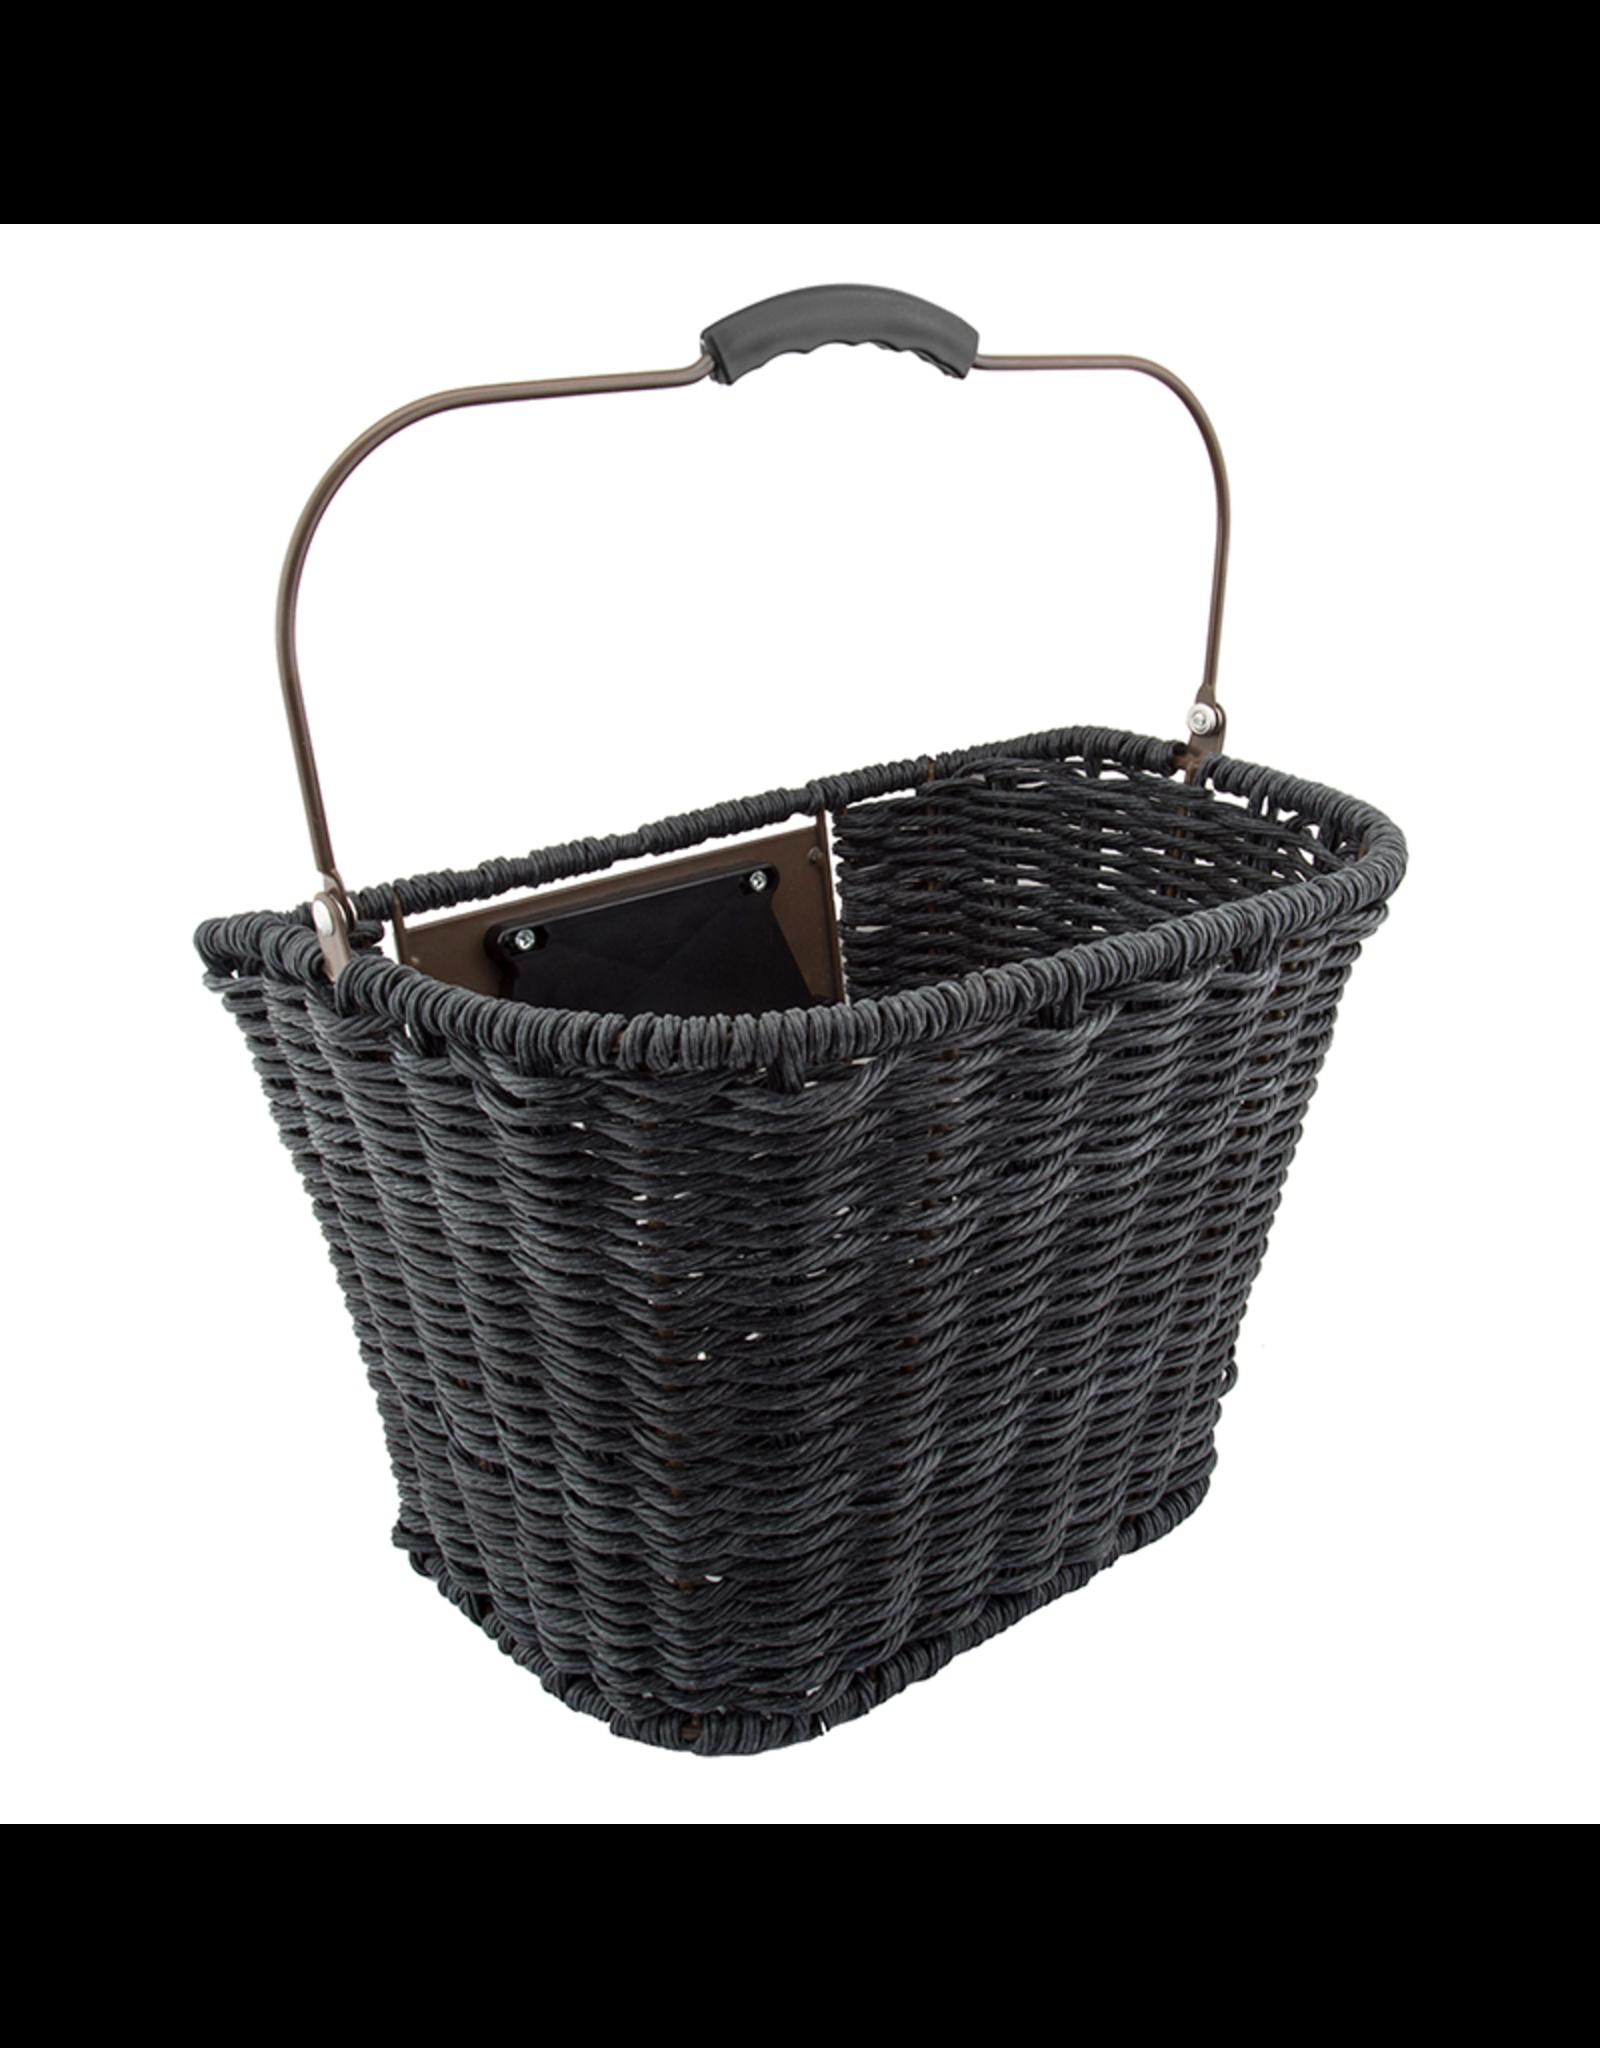 Sunlite Sunlite Front Basket - Synthetic Wicker QR